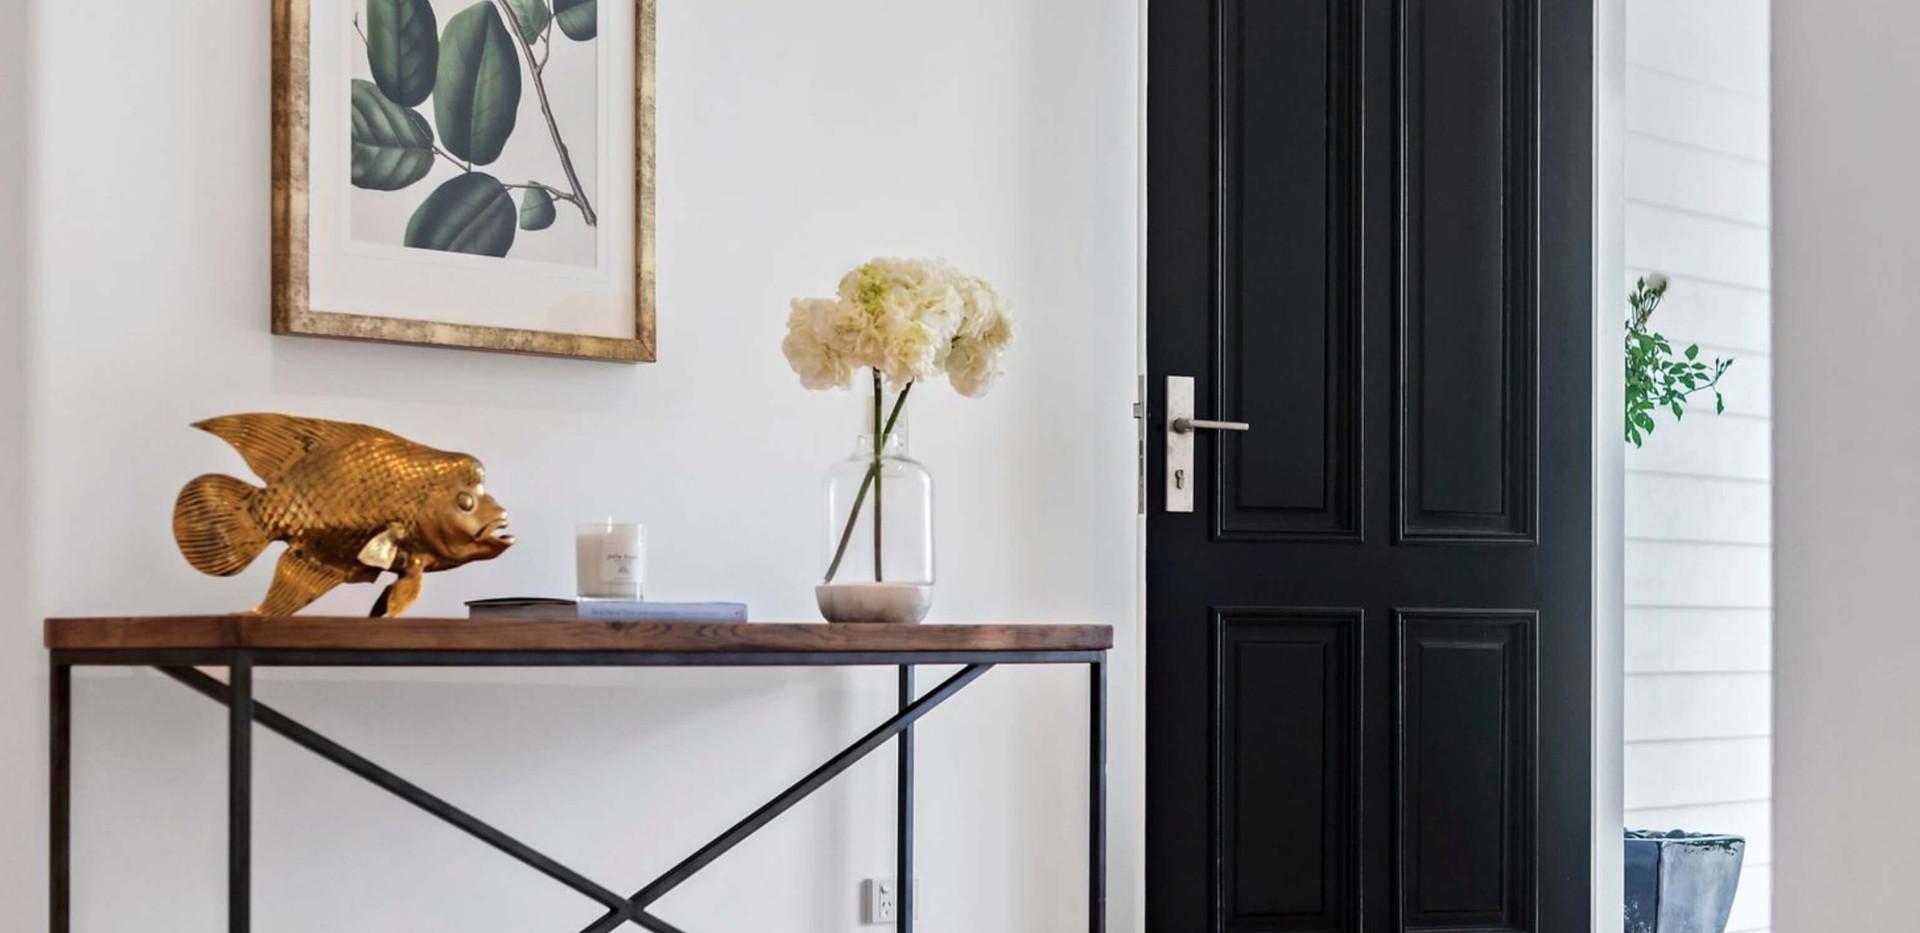 Seaforth Hamptons House - Residential interior design